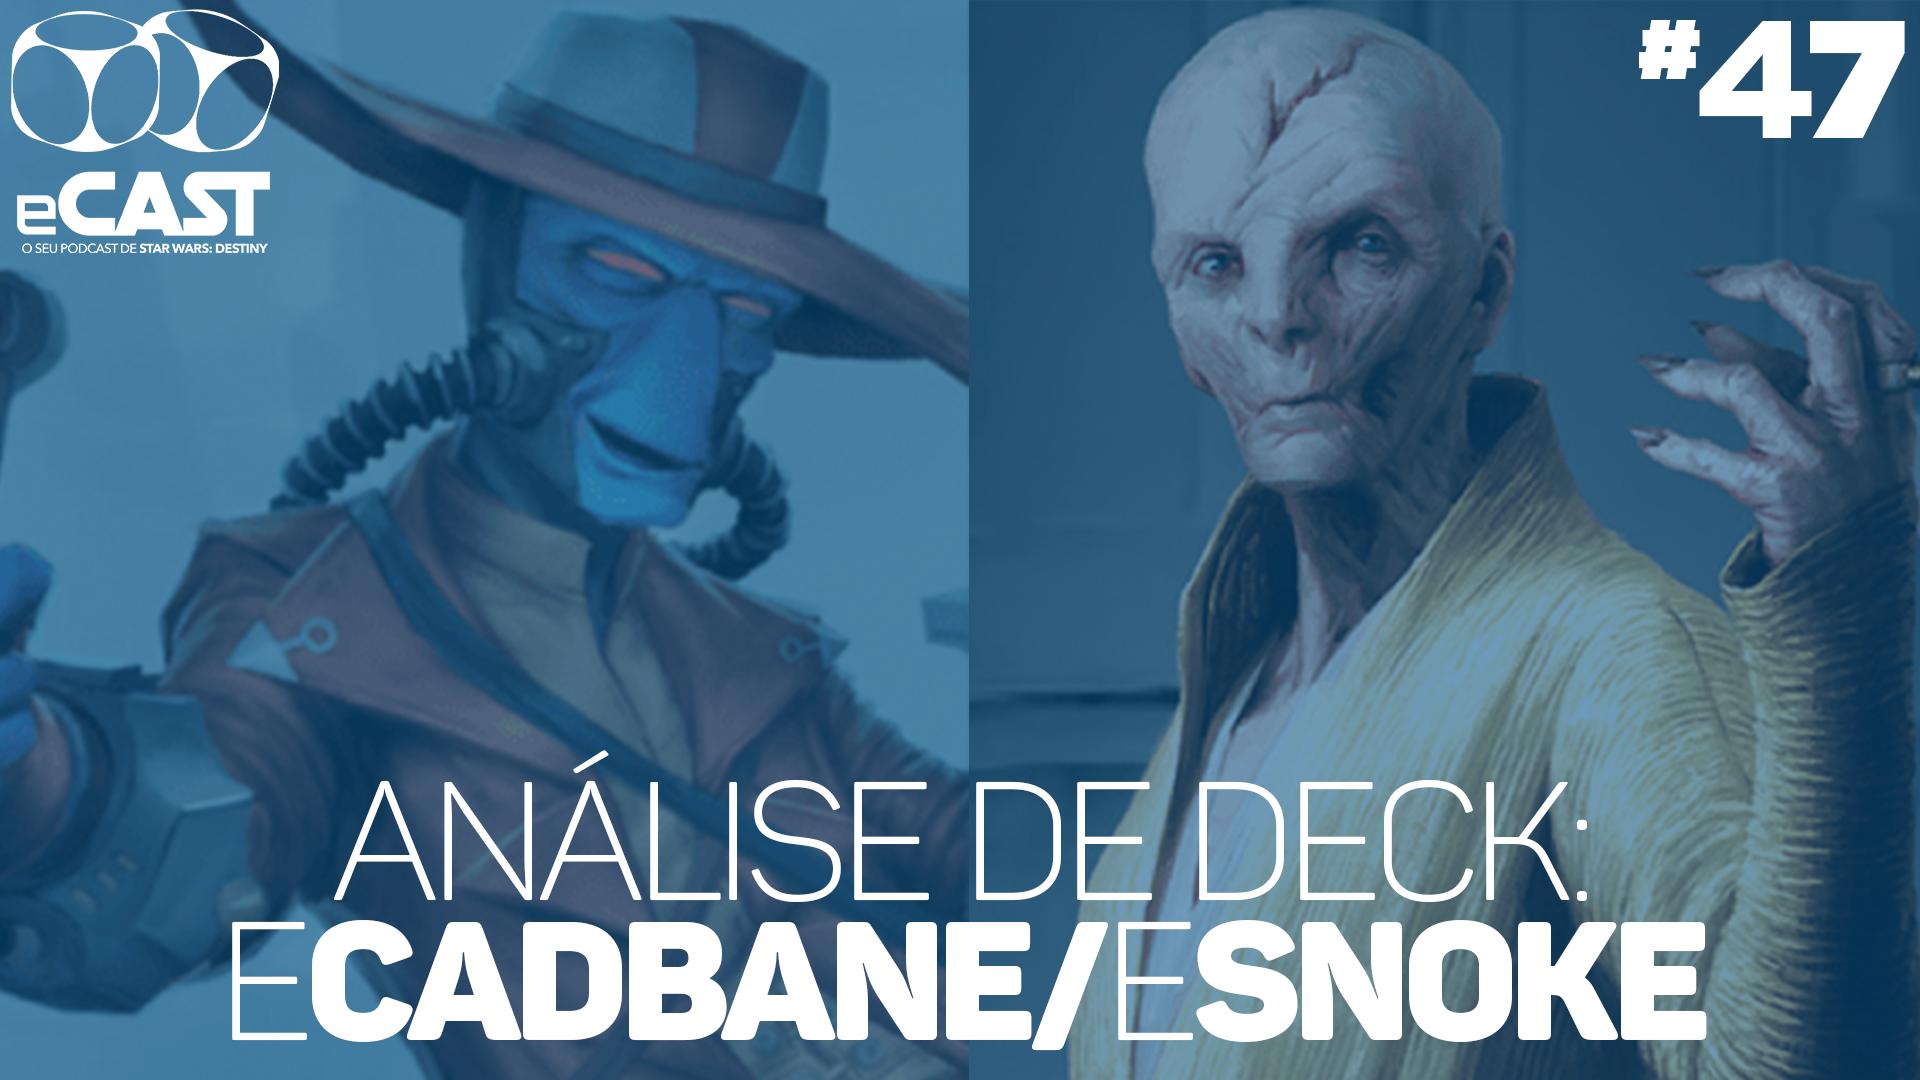 eCast 47 – Análise de deck: eCadBane/eSnoke